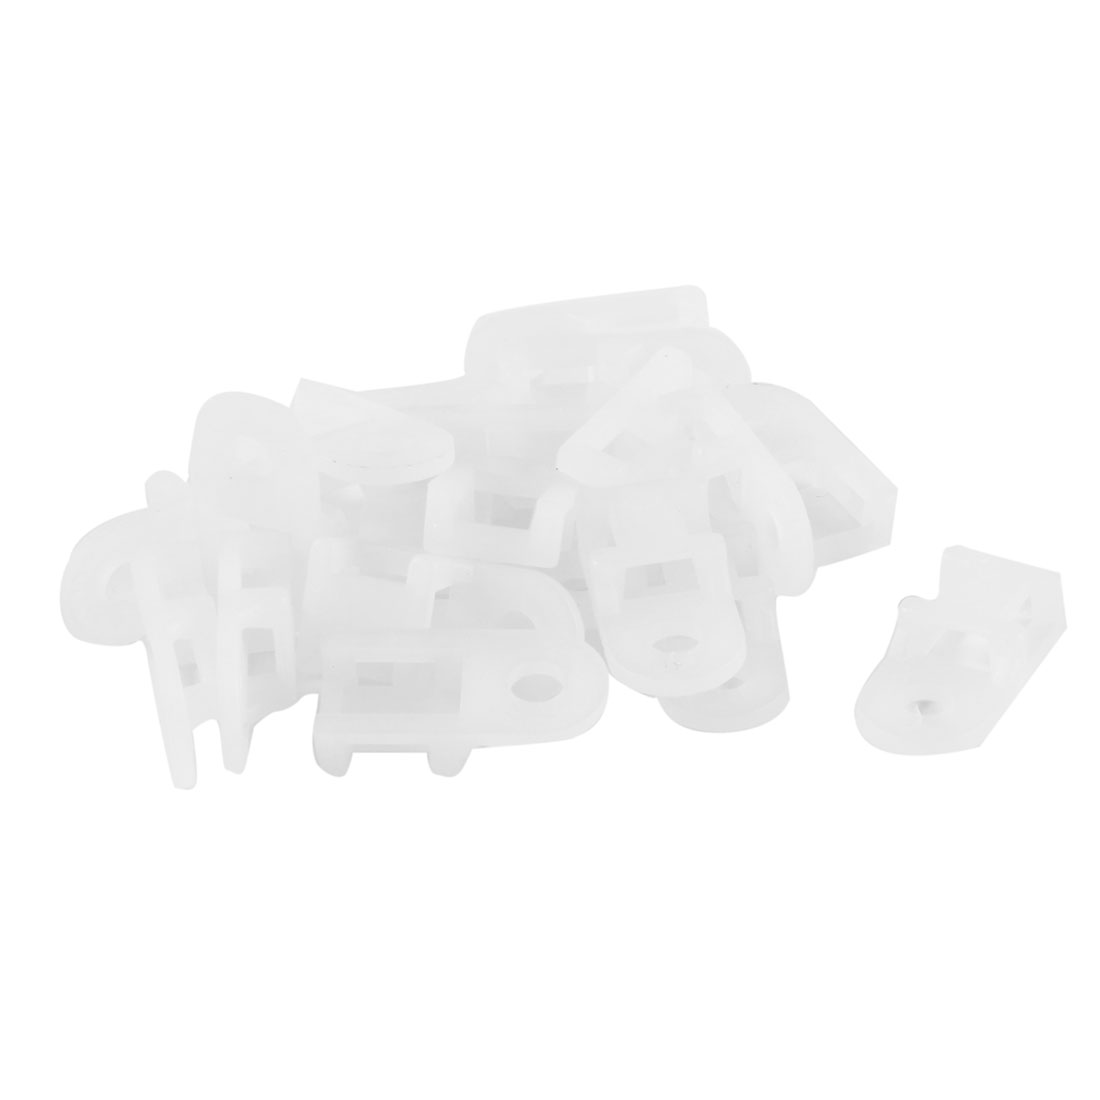 20 Pieces Off White Plastic Wire Bundle Cable Tie Mount Saddle Base